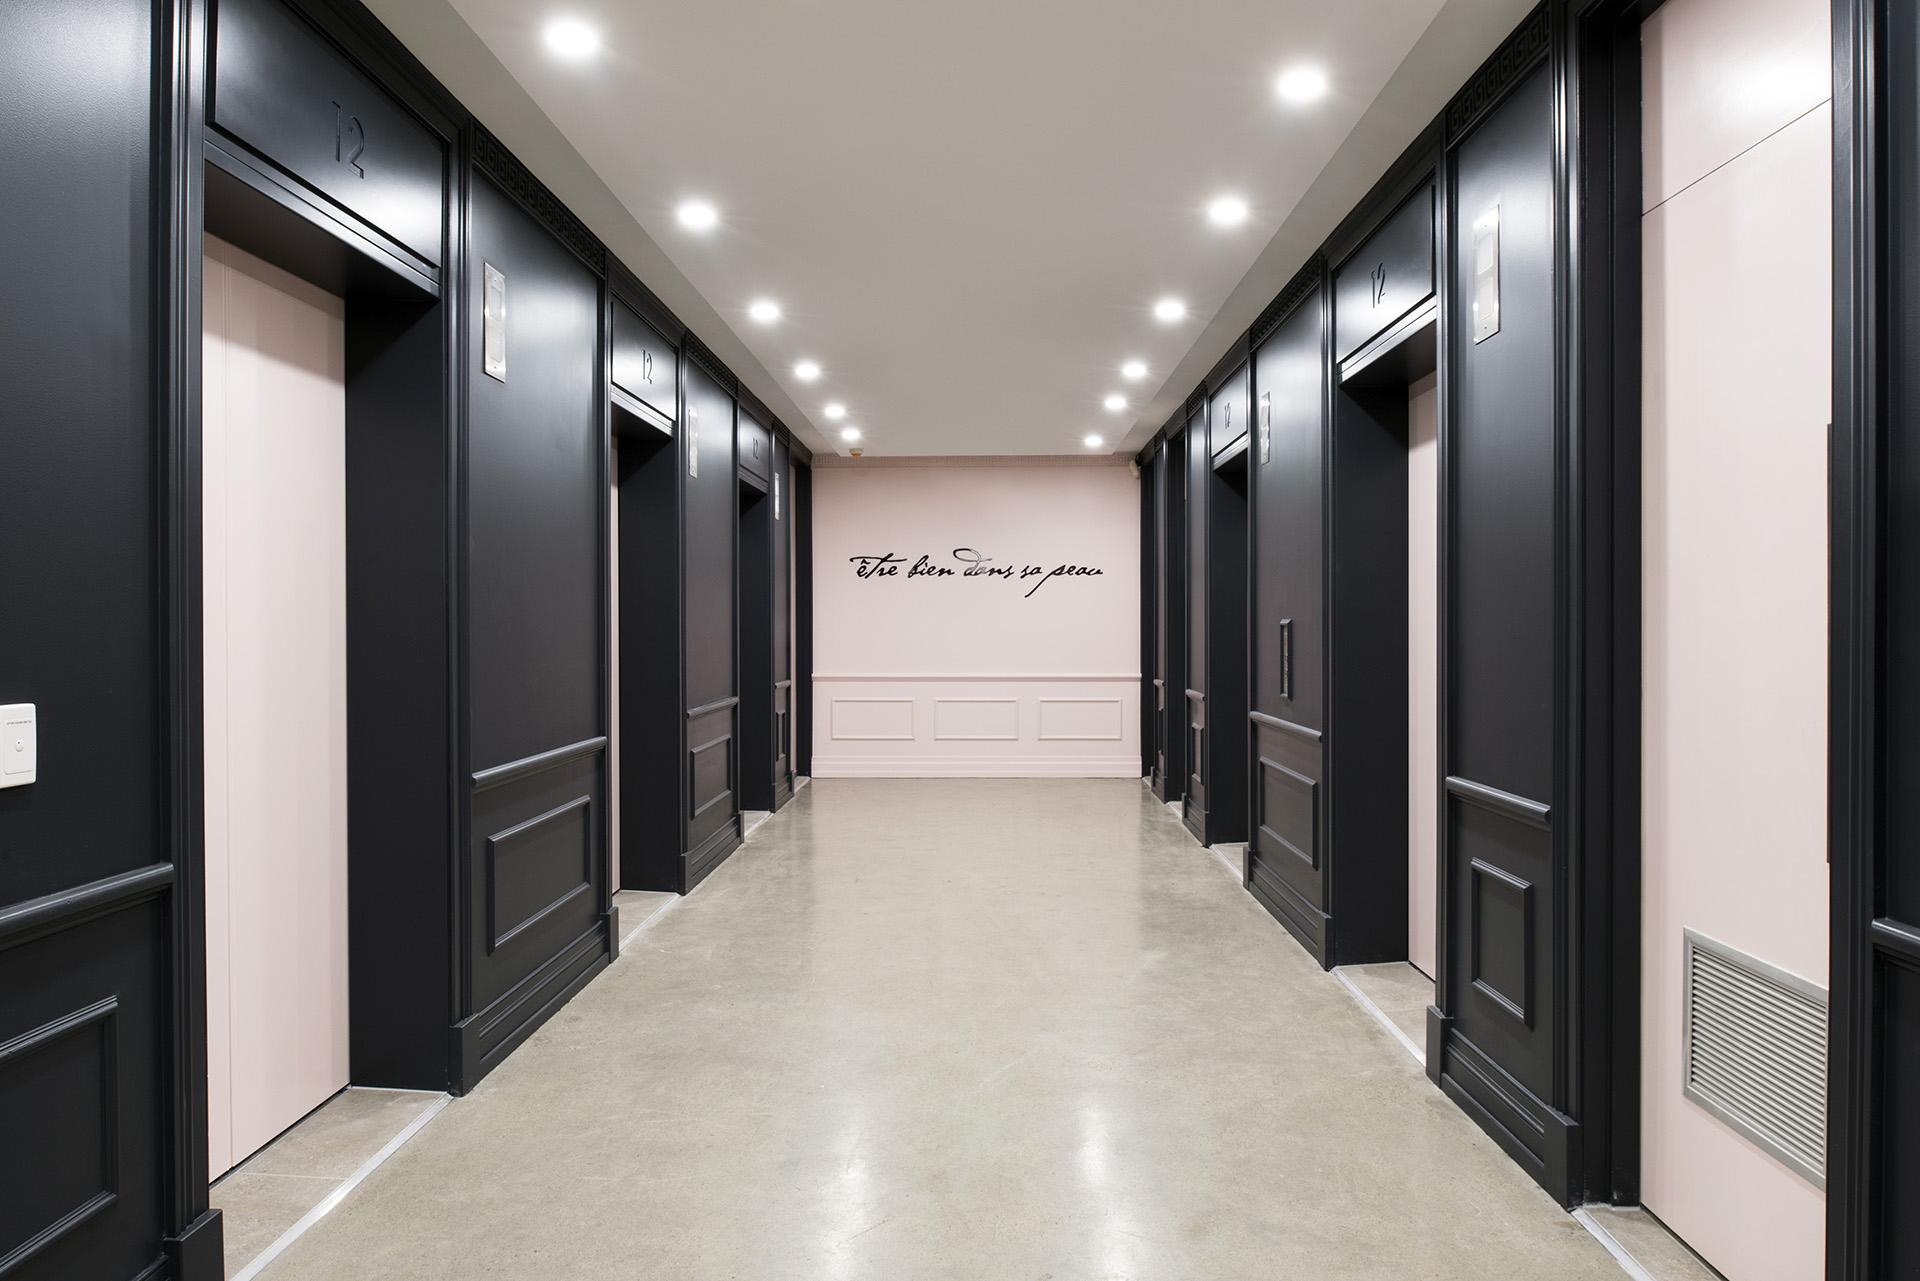 Archway-French Office Design Brisbane- Lift Lobby.jpg